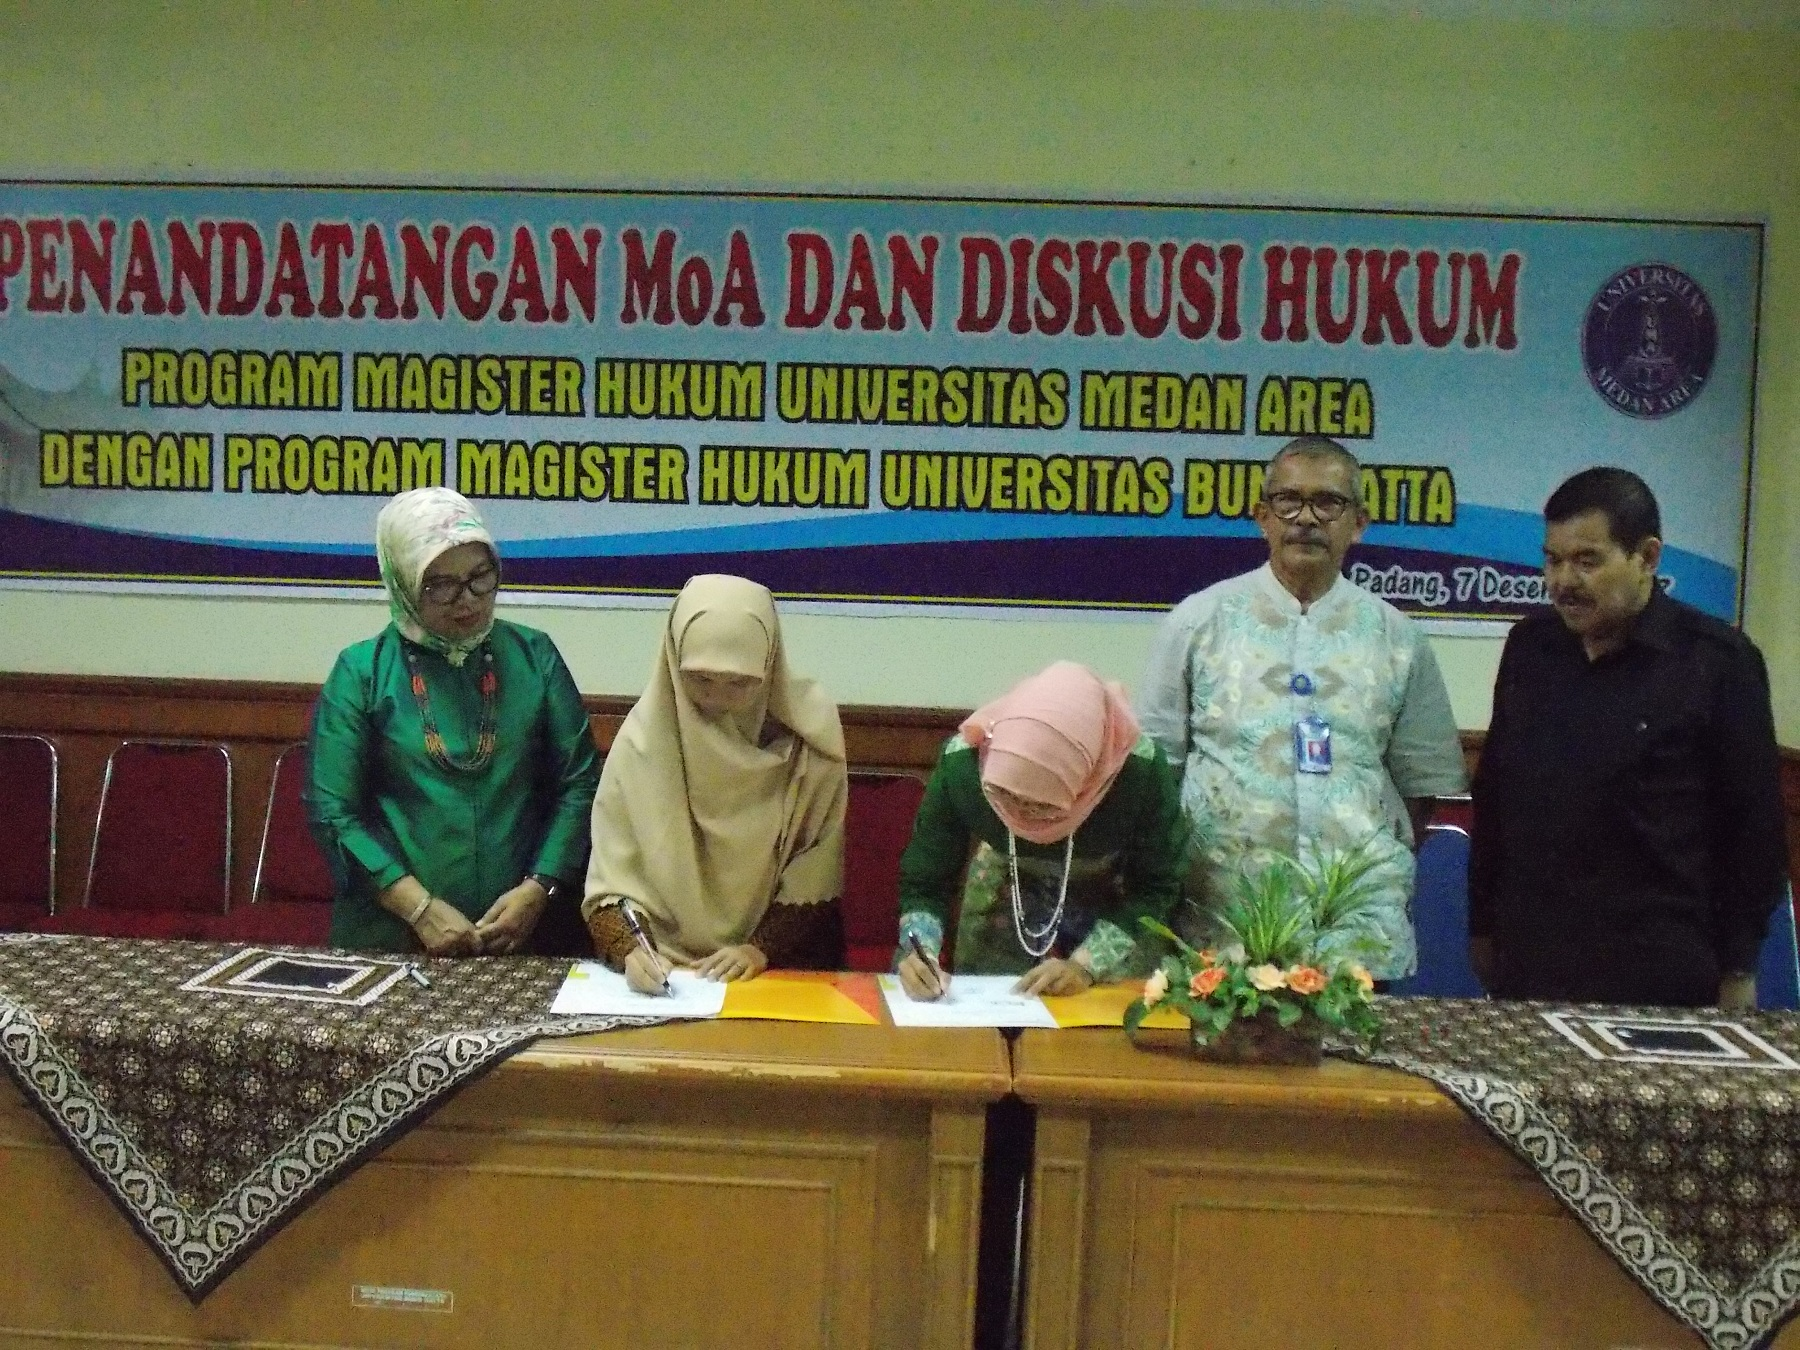 Program Pascasarjana Uma Laksanakan Penandatanganan Mou Di Sumatera Barat Magister Ilmu Administrasi Publik Universitas Medan Area Prodi Magister Ilmu Administrasi Publik Terbaik Di Sumut